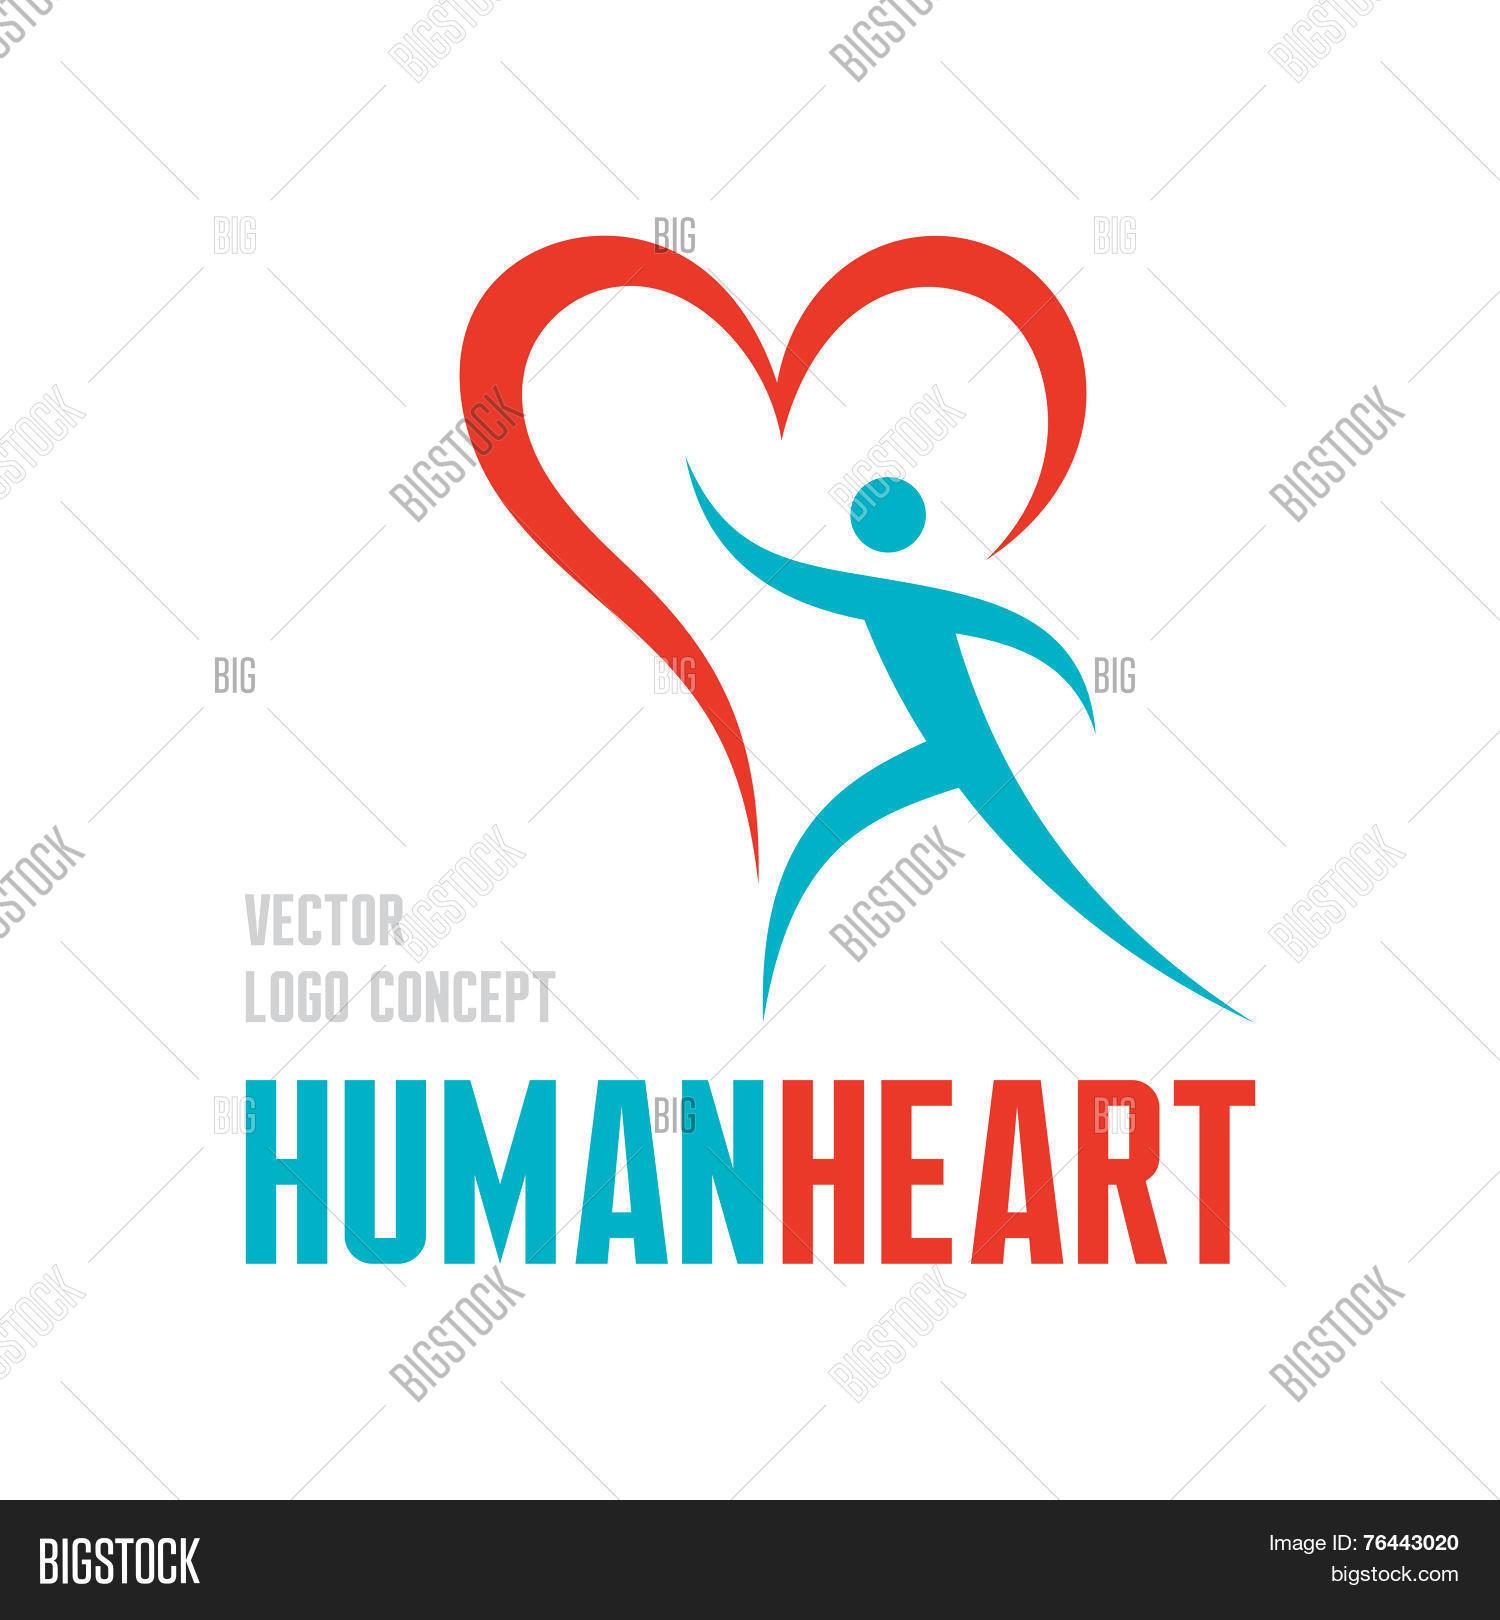 Human Heart Vector Vector Photo Free Trial Bigstock